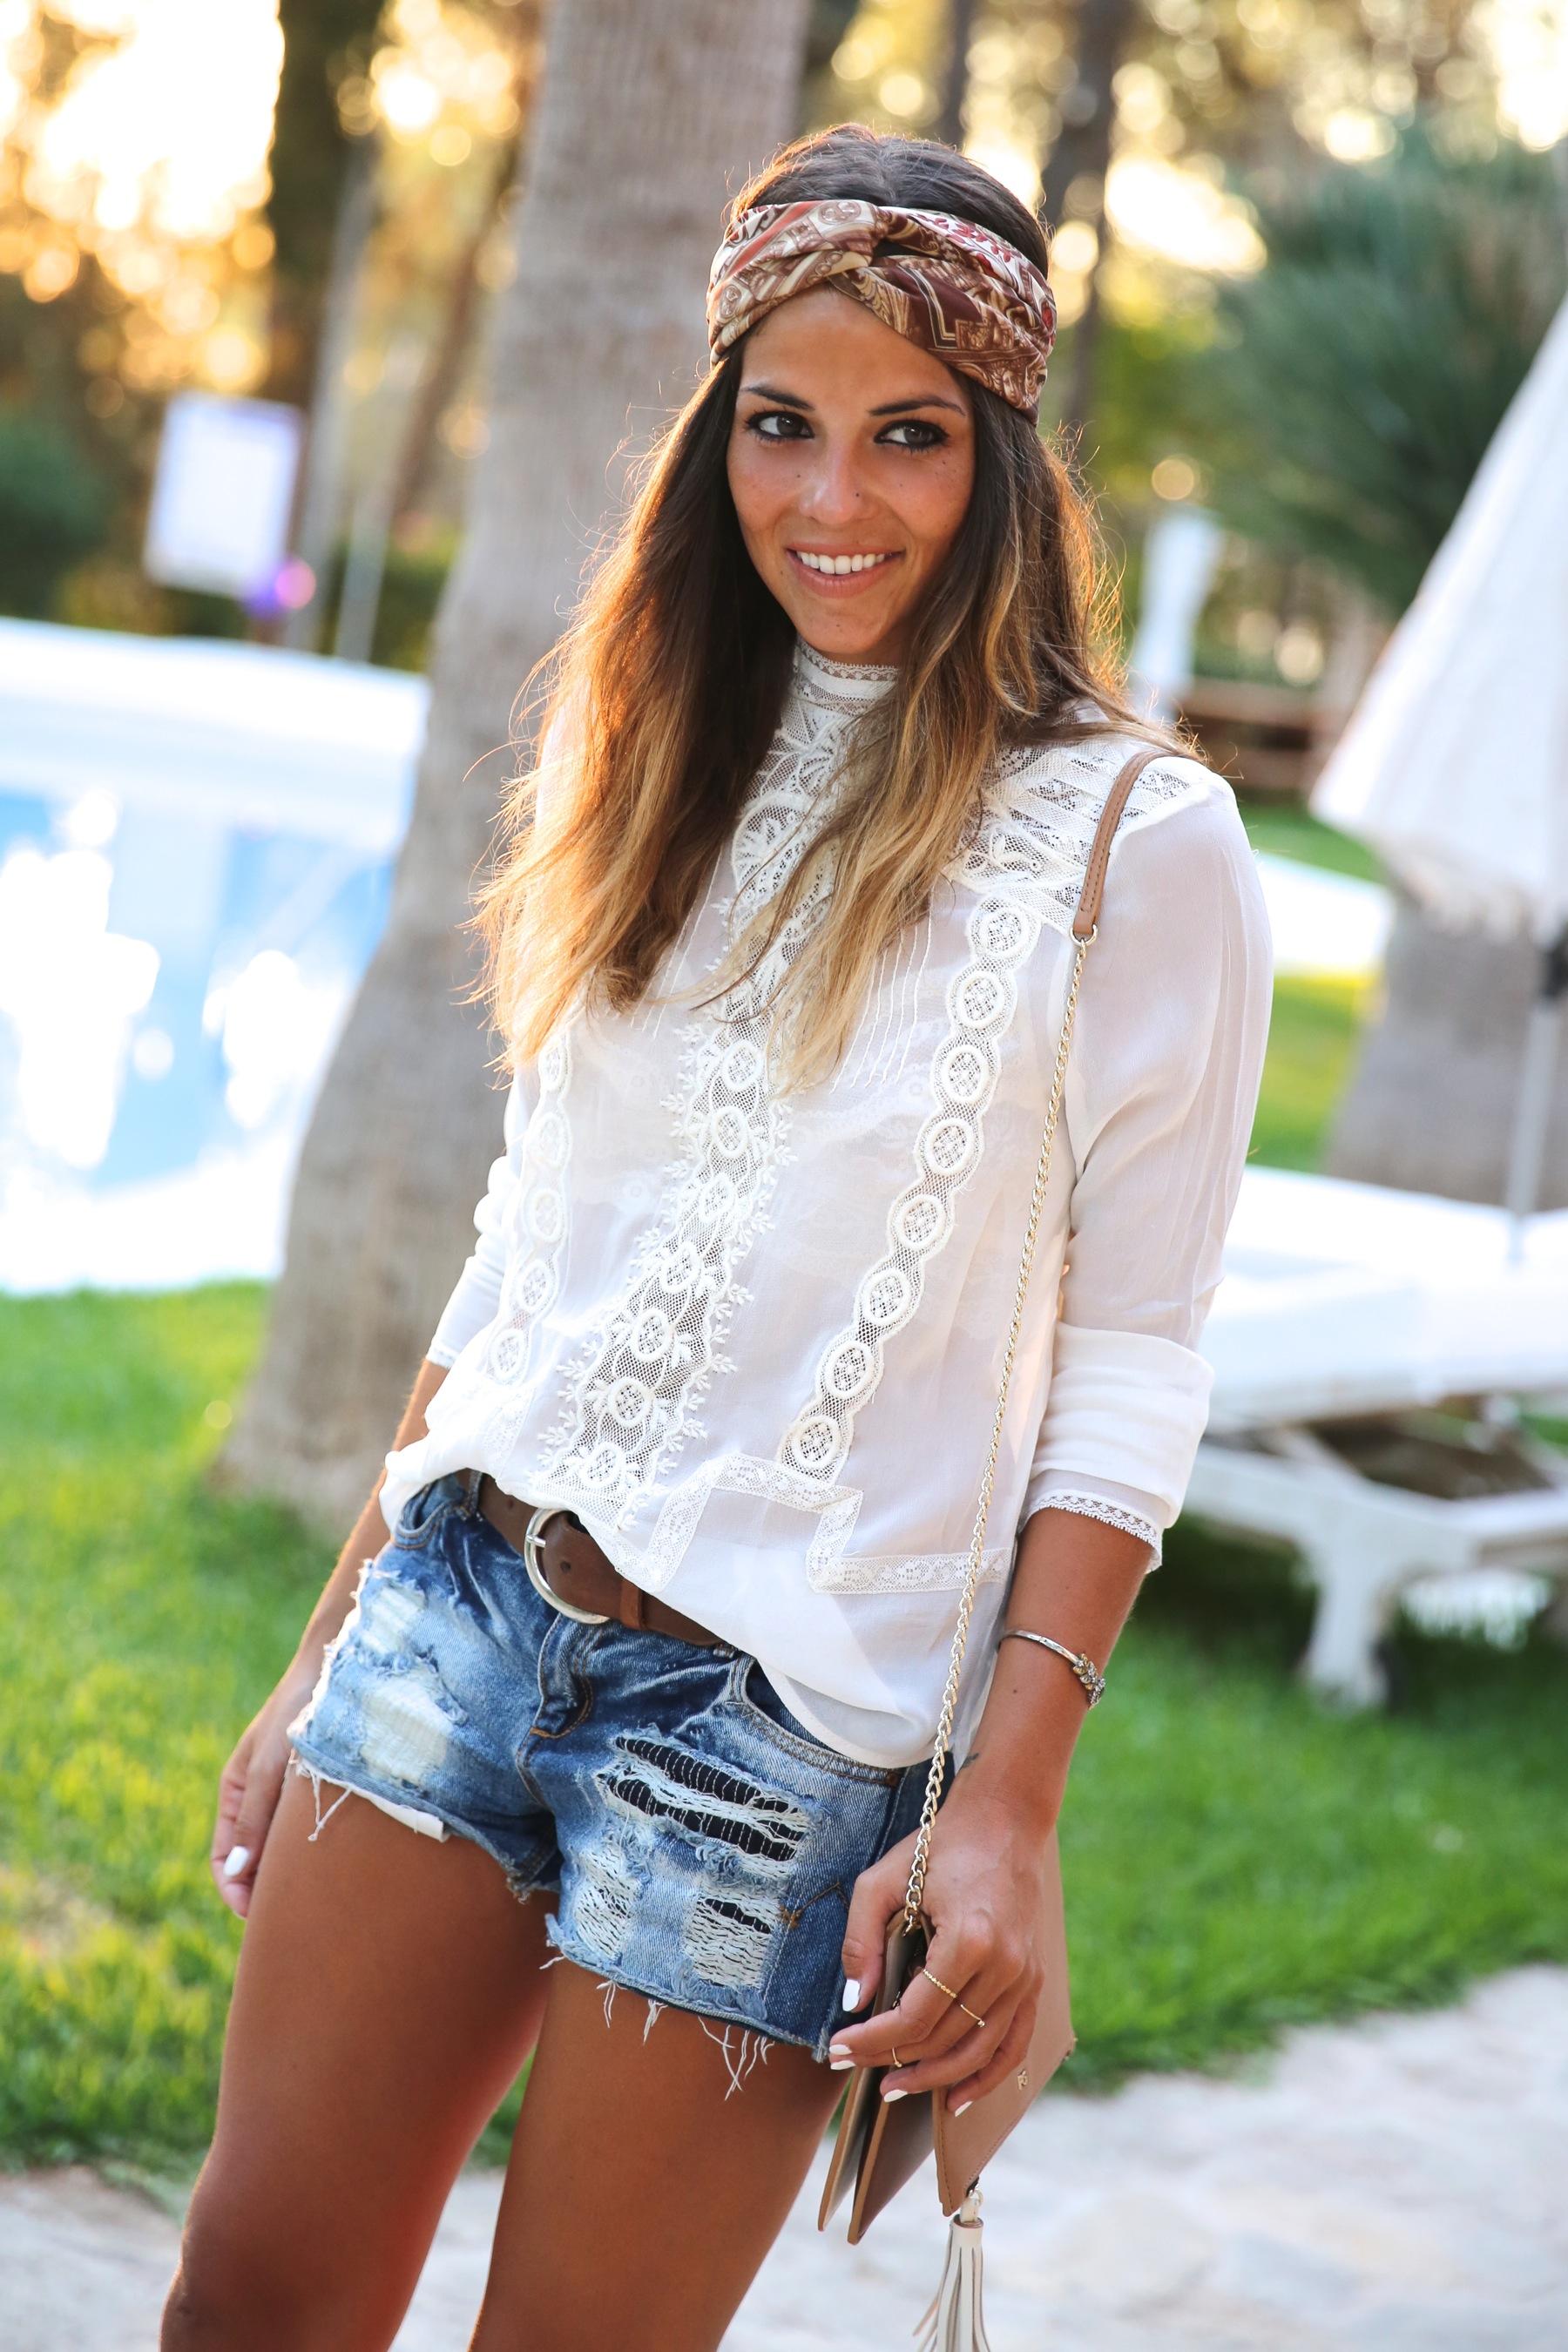 trendy_taste-look-outfit-street_style-ootd-blog-blogger-fashion_spain-moda_españa-boho-hippie-denim_shorts-shorts_vaqueros-blusa-blouse-mas34-pg-ibiza-sa_talaia-7